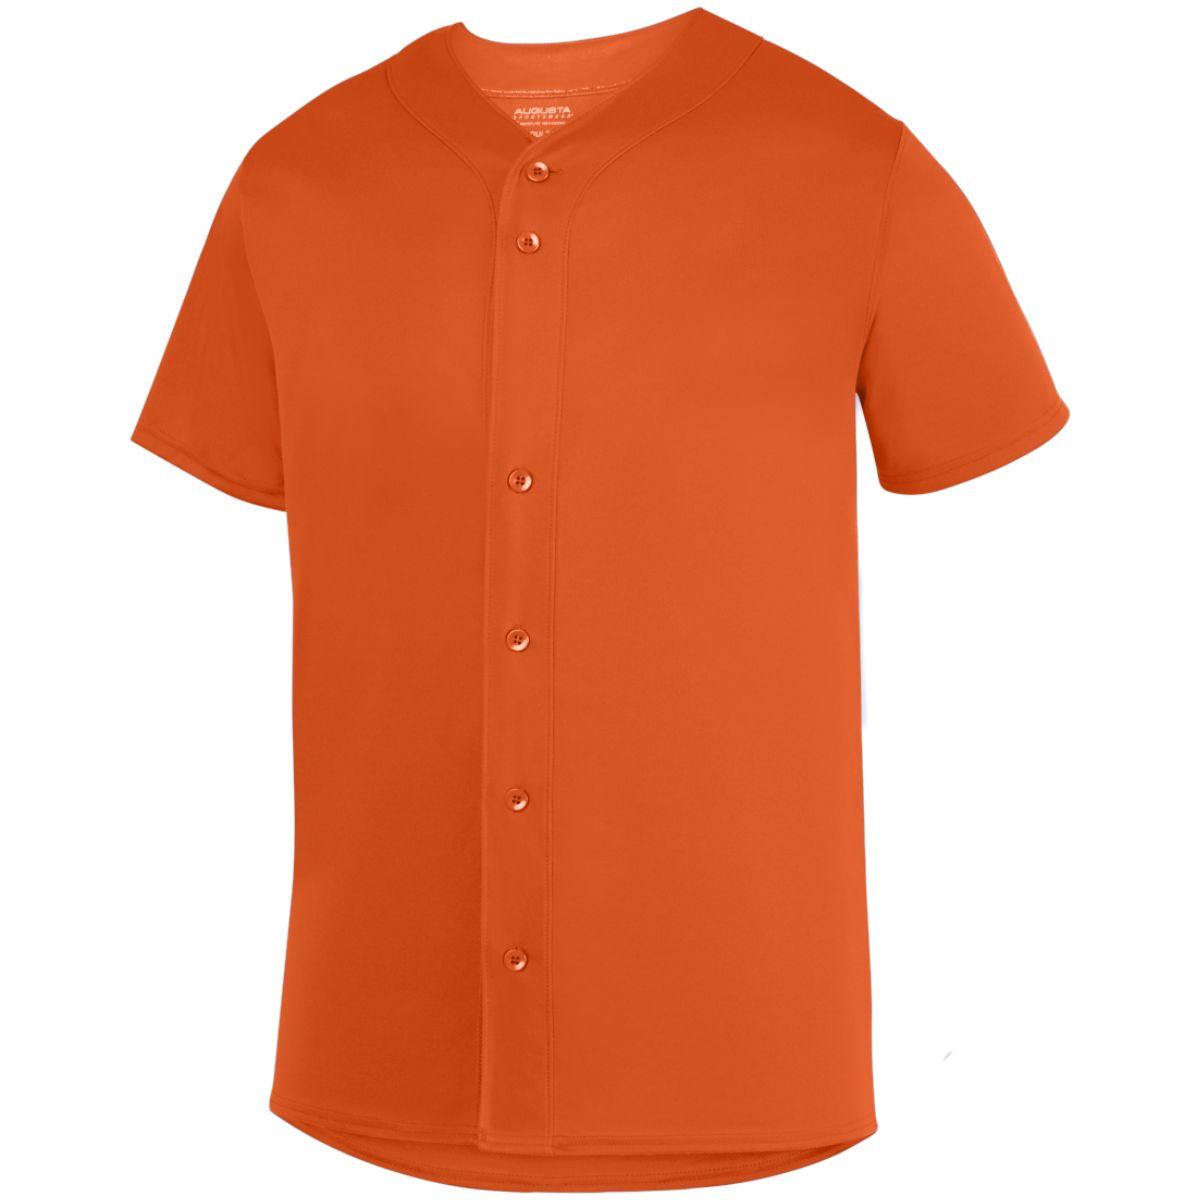 Augusta Youth Sultan Jersey Orange S - image 1 de 1